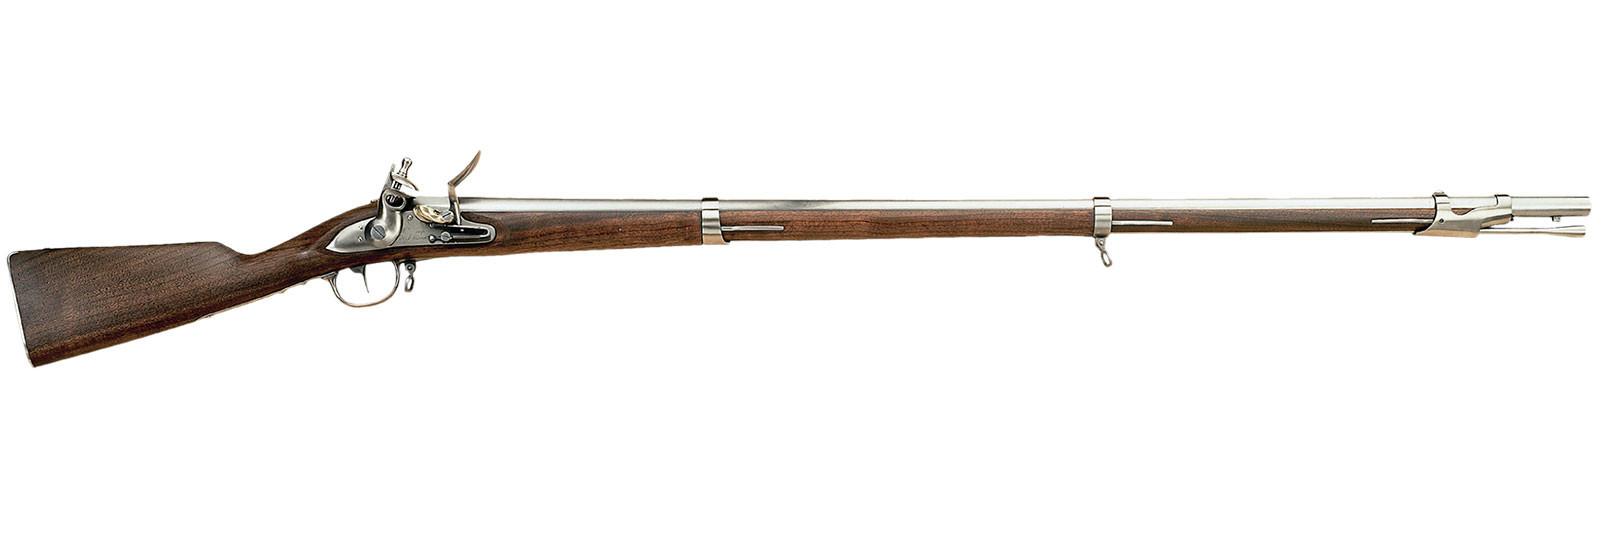 "1777 Corrige' ""An IX"" Rifle"